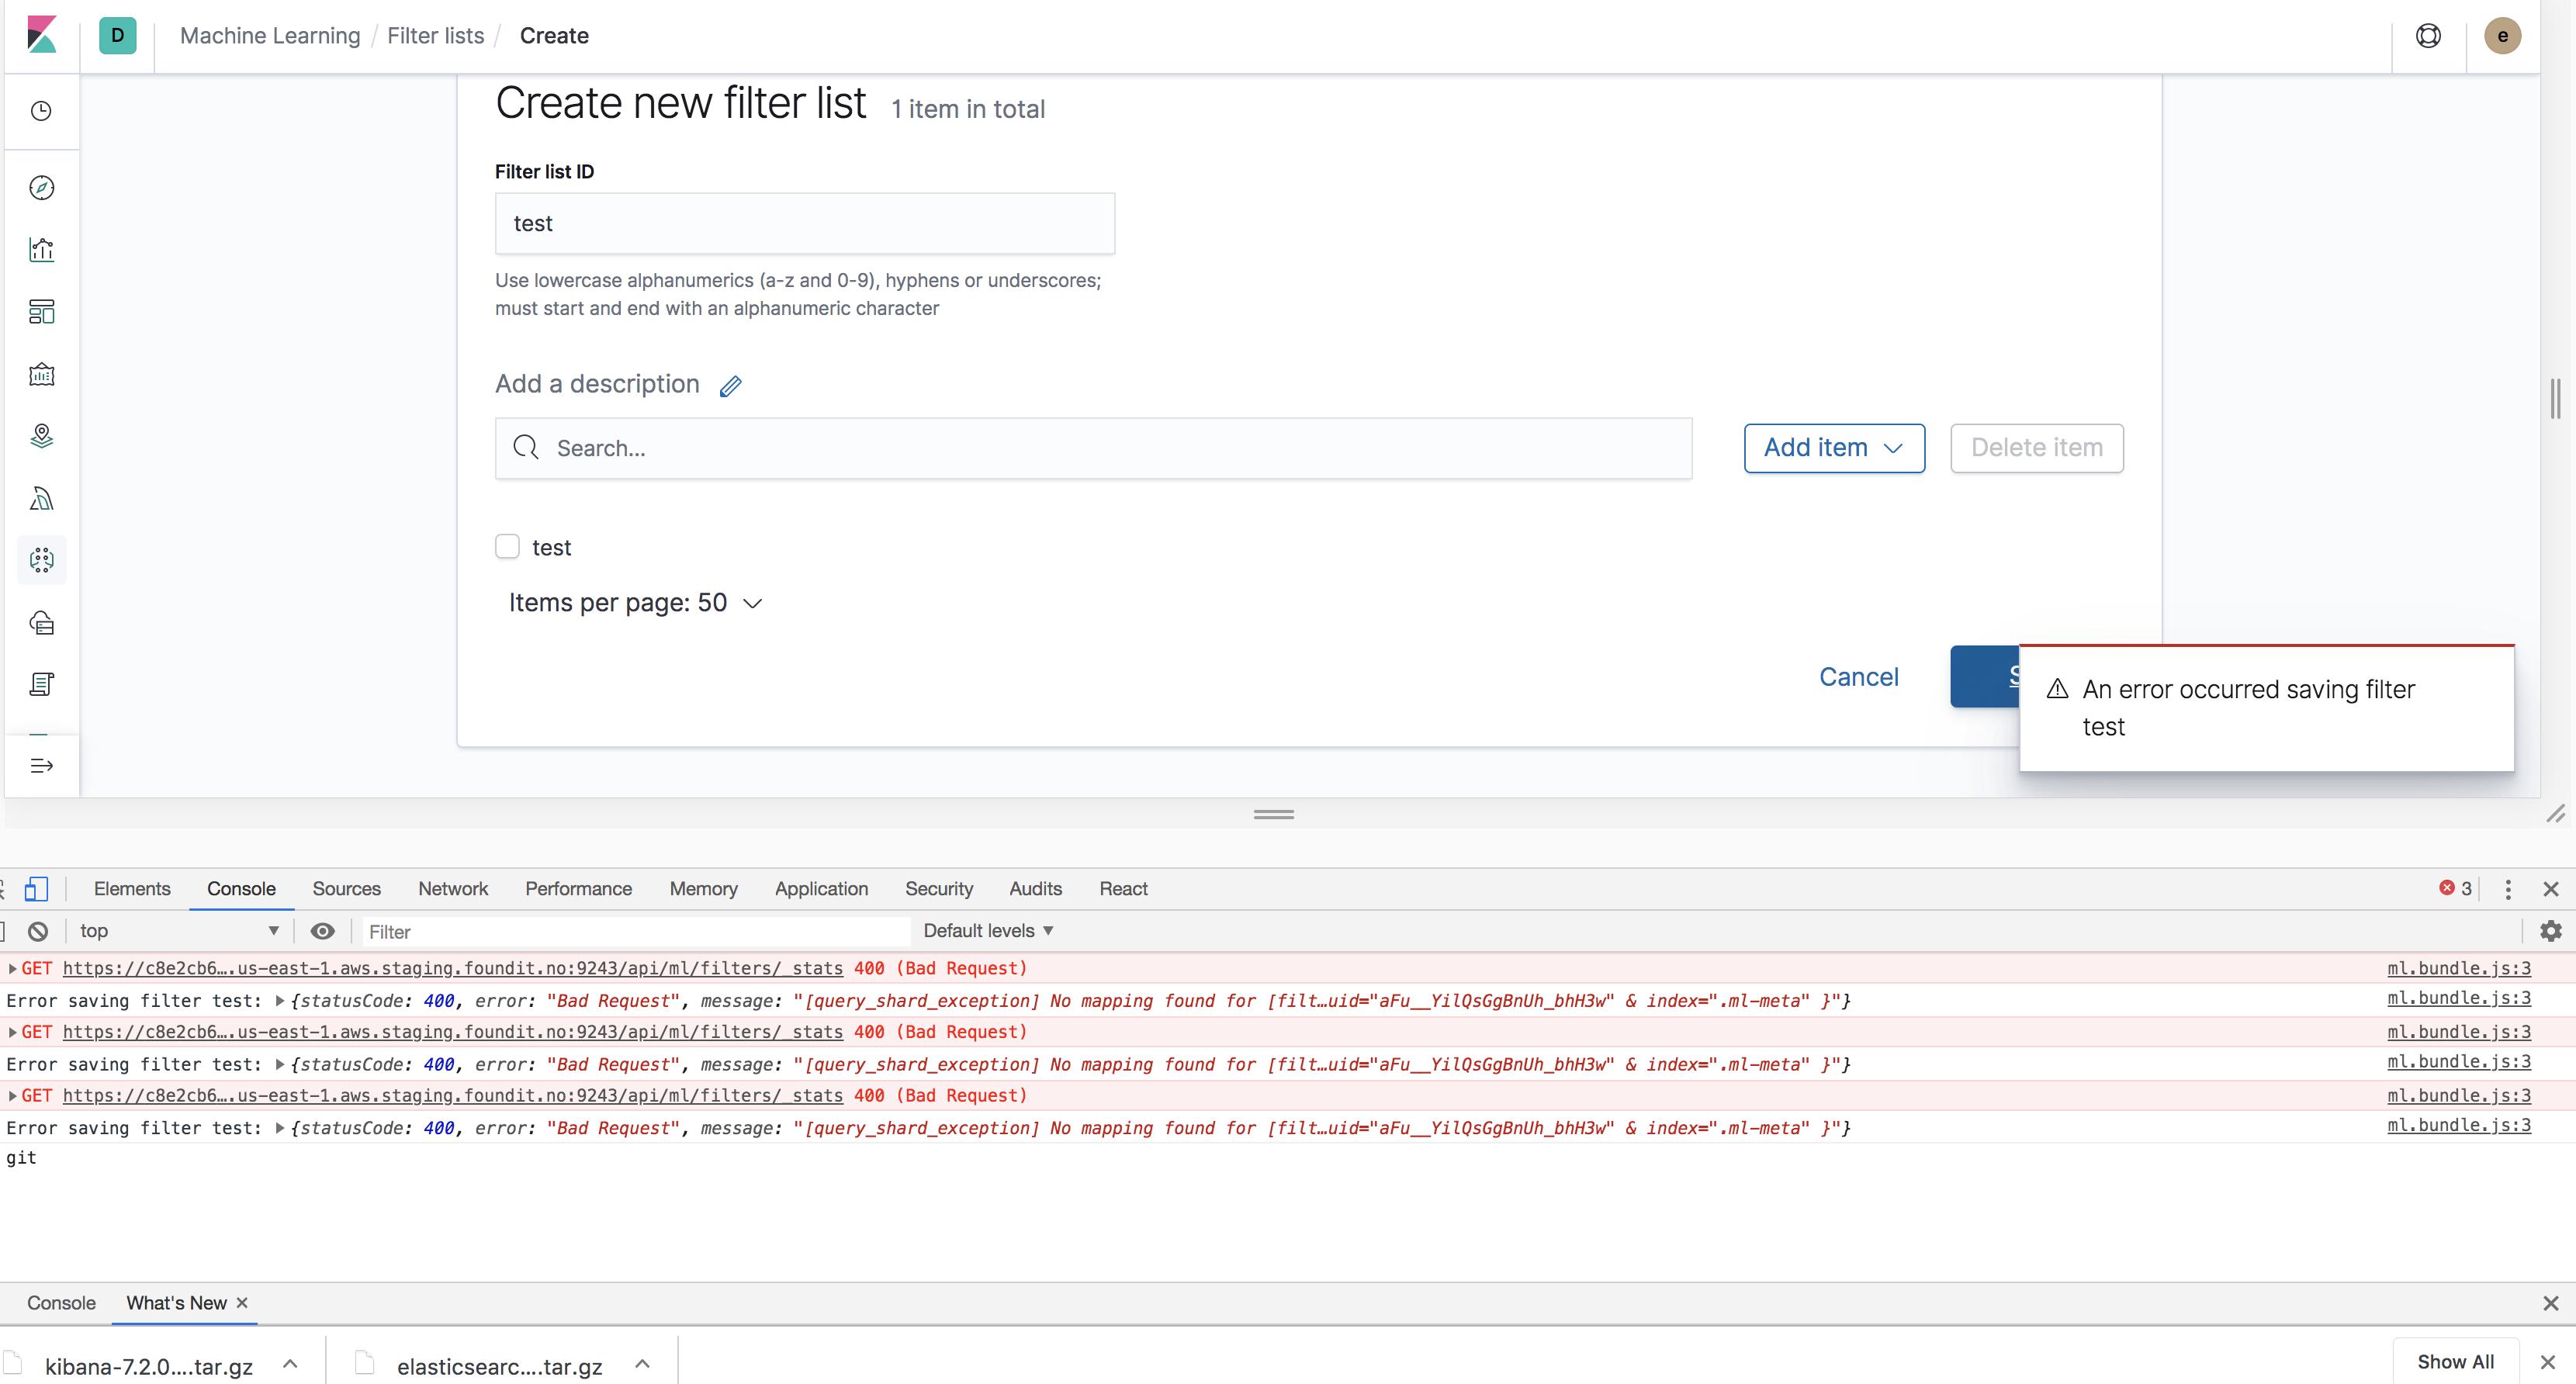 ML- Filter lists - error message seen on clicking refresh